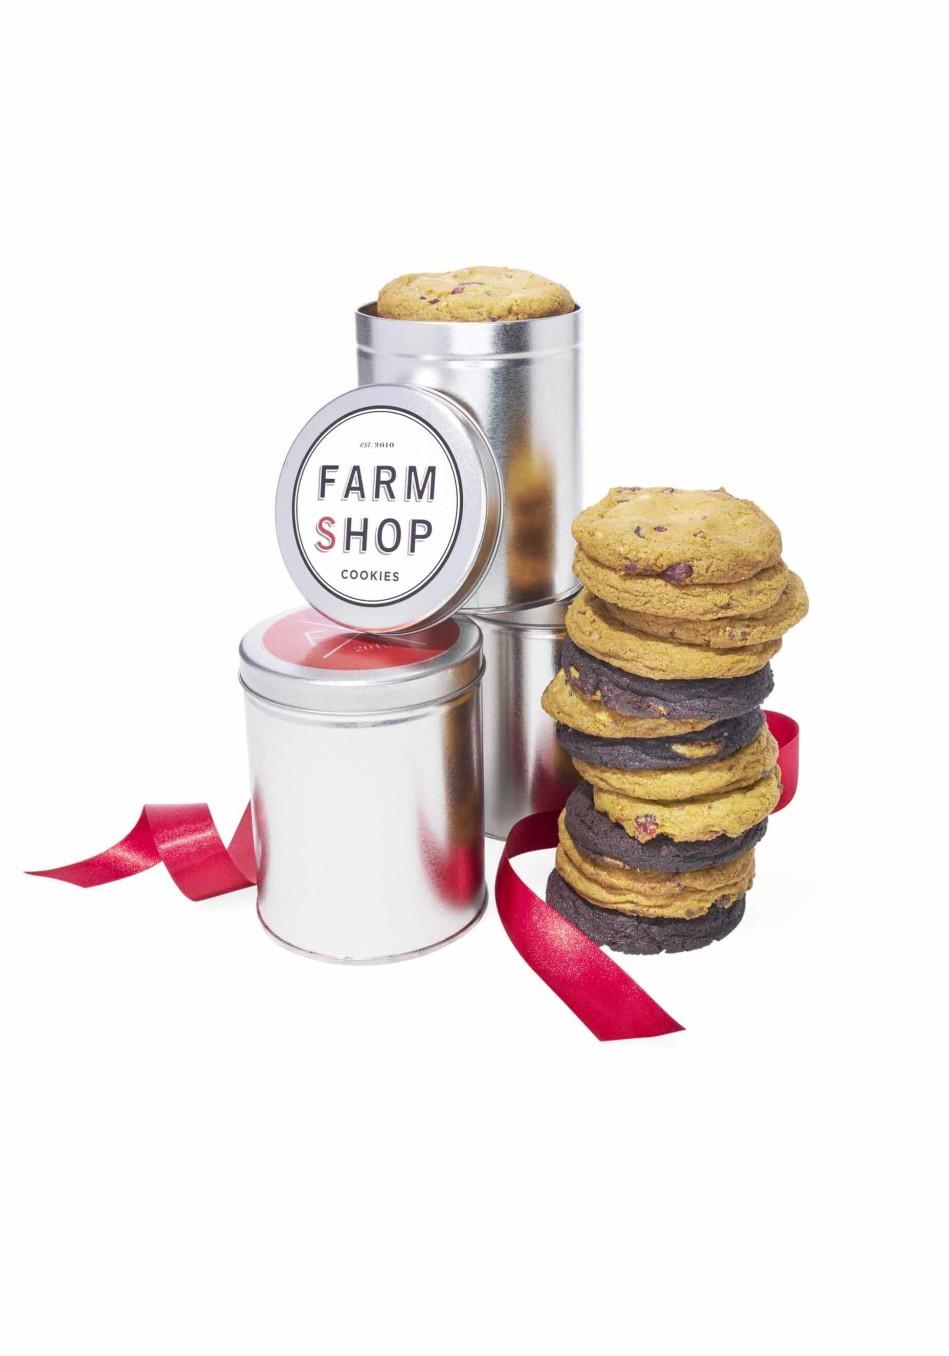 Oprah's Favorite Things 2016 Full List - Farmshop Holiday ...